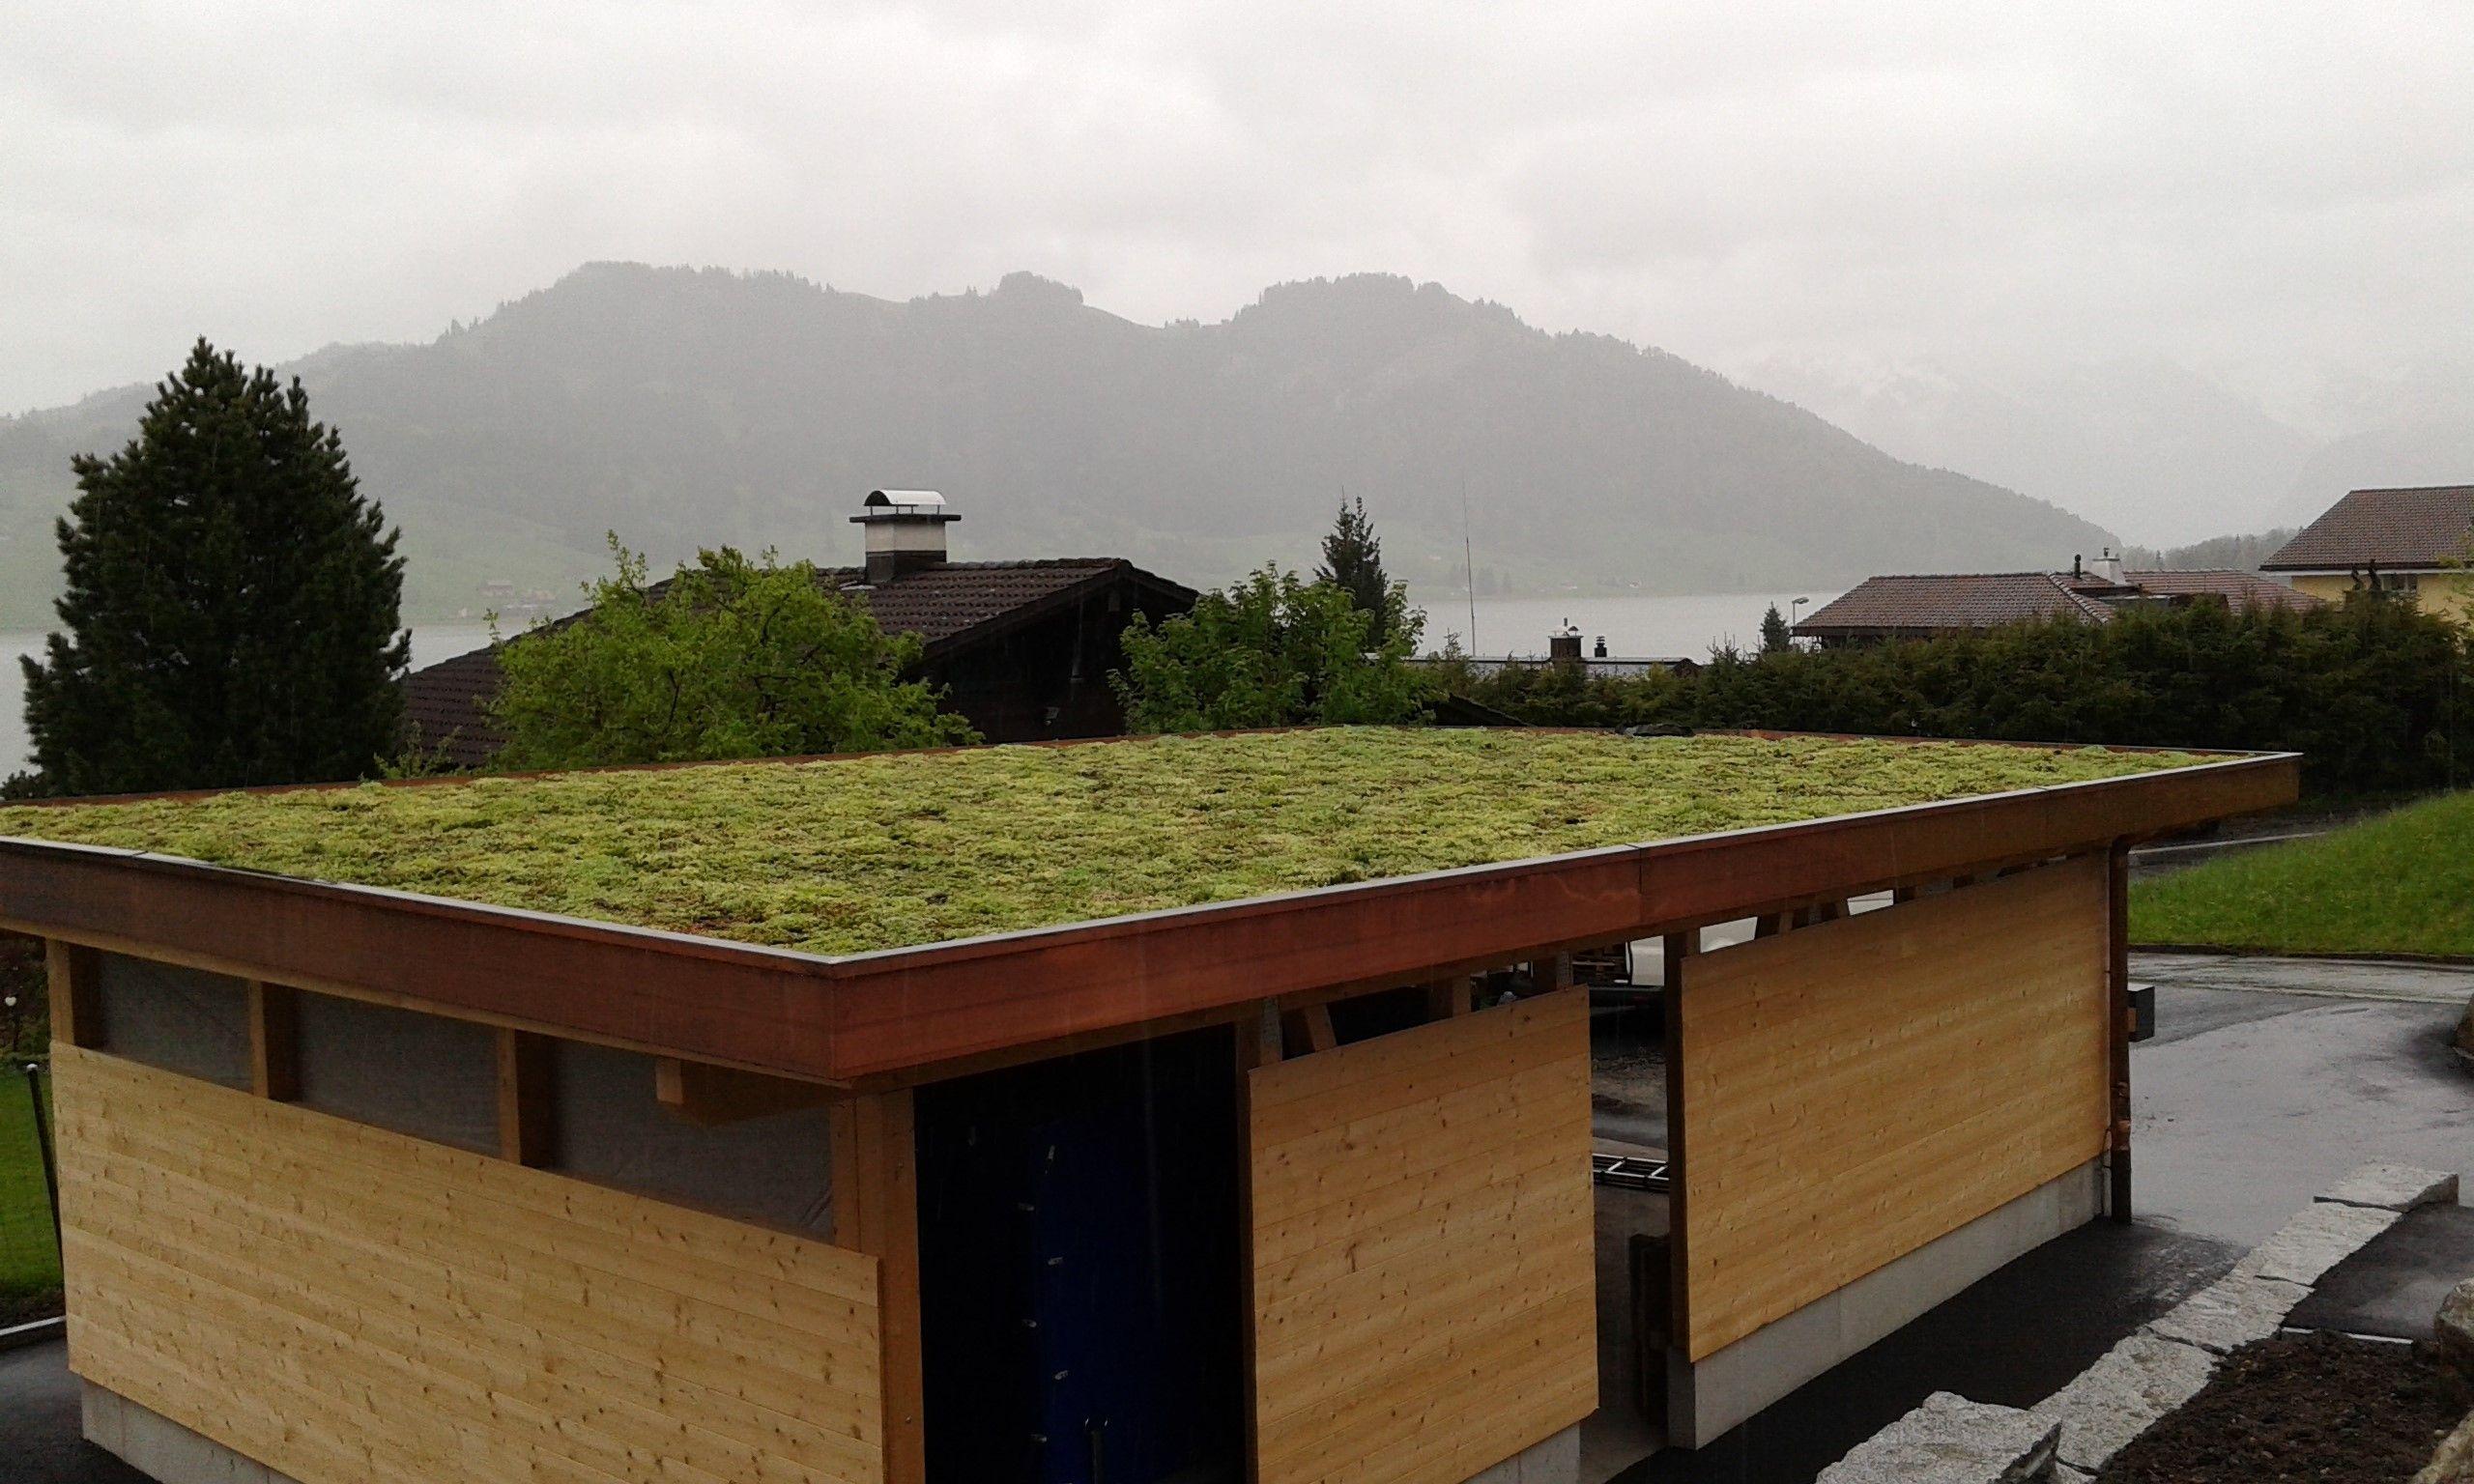 Dachbegrünung (mit Bildern) Dachbegrünung, Dach, Carport